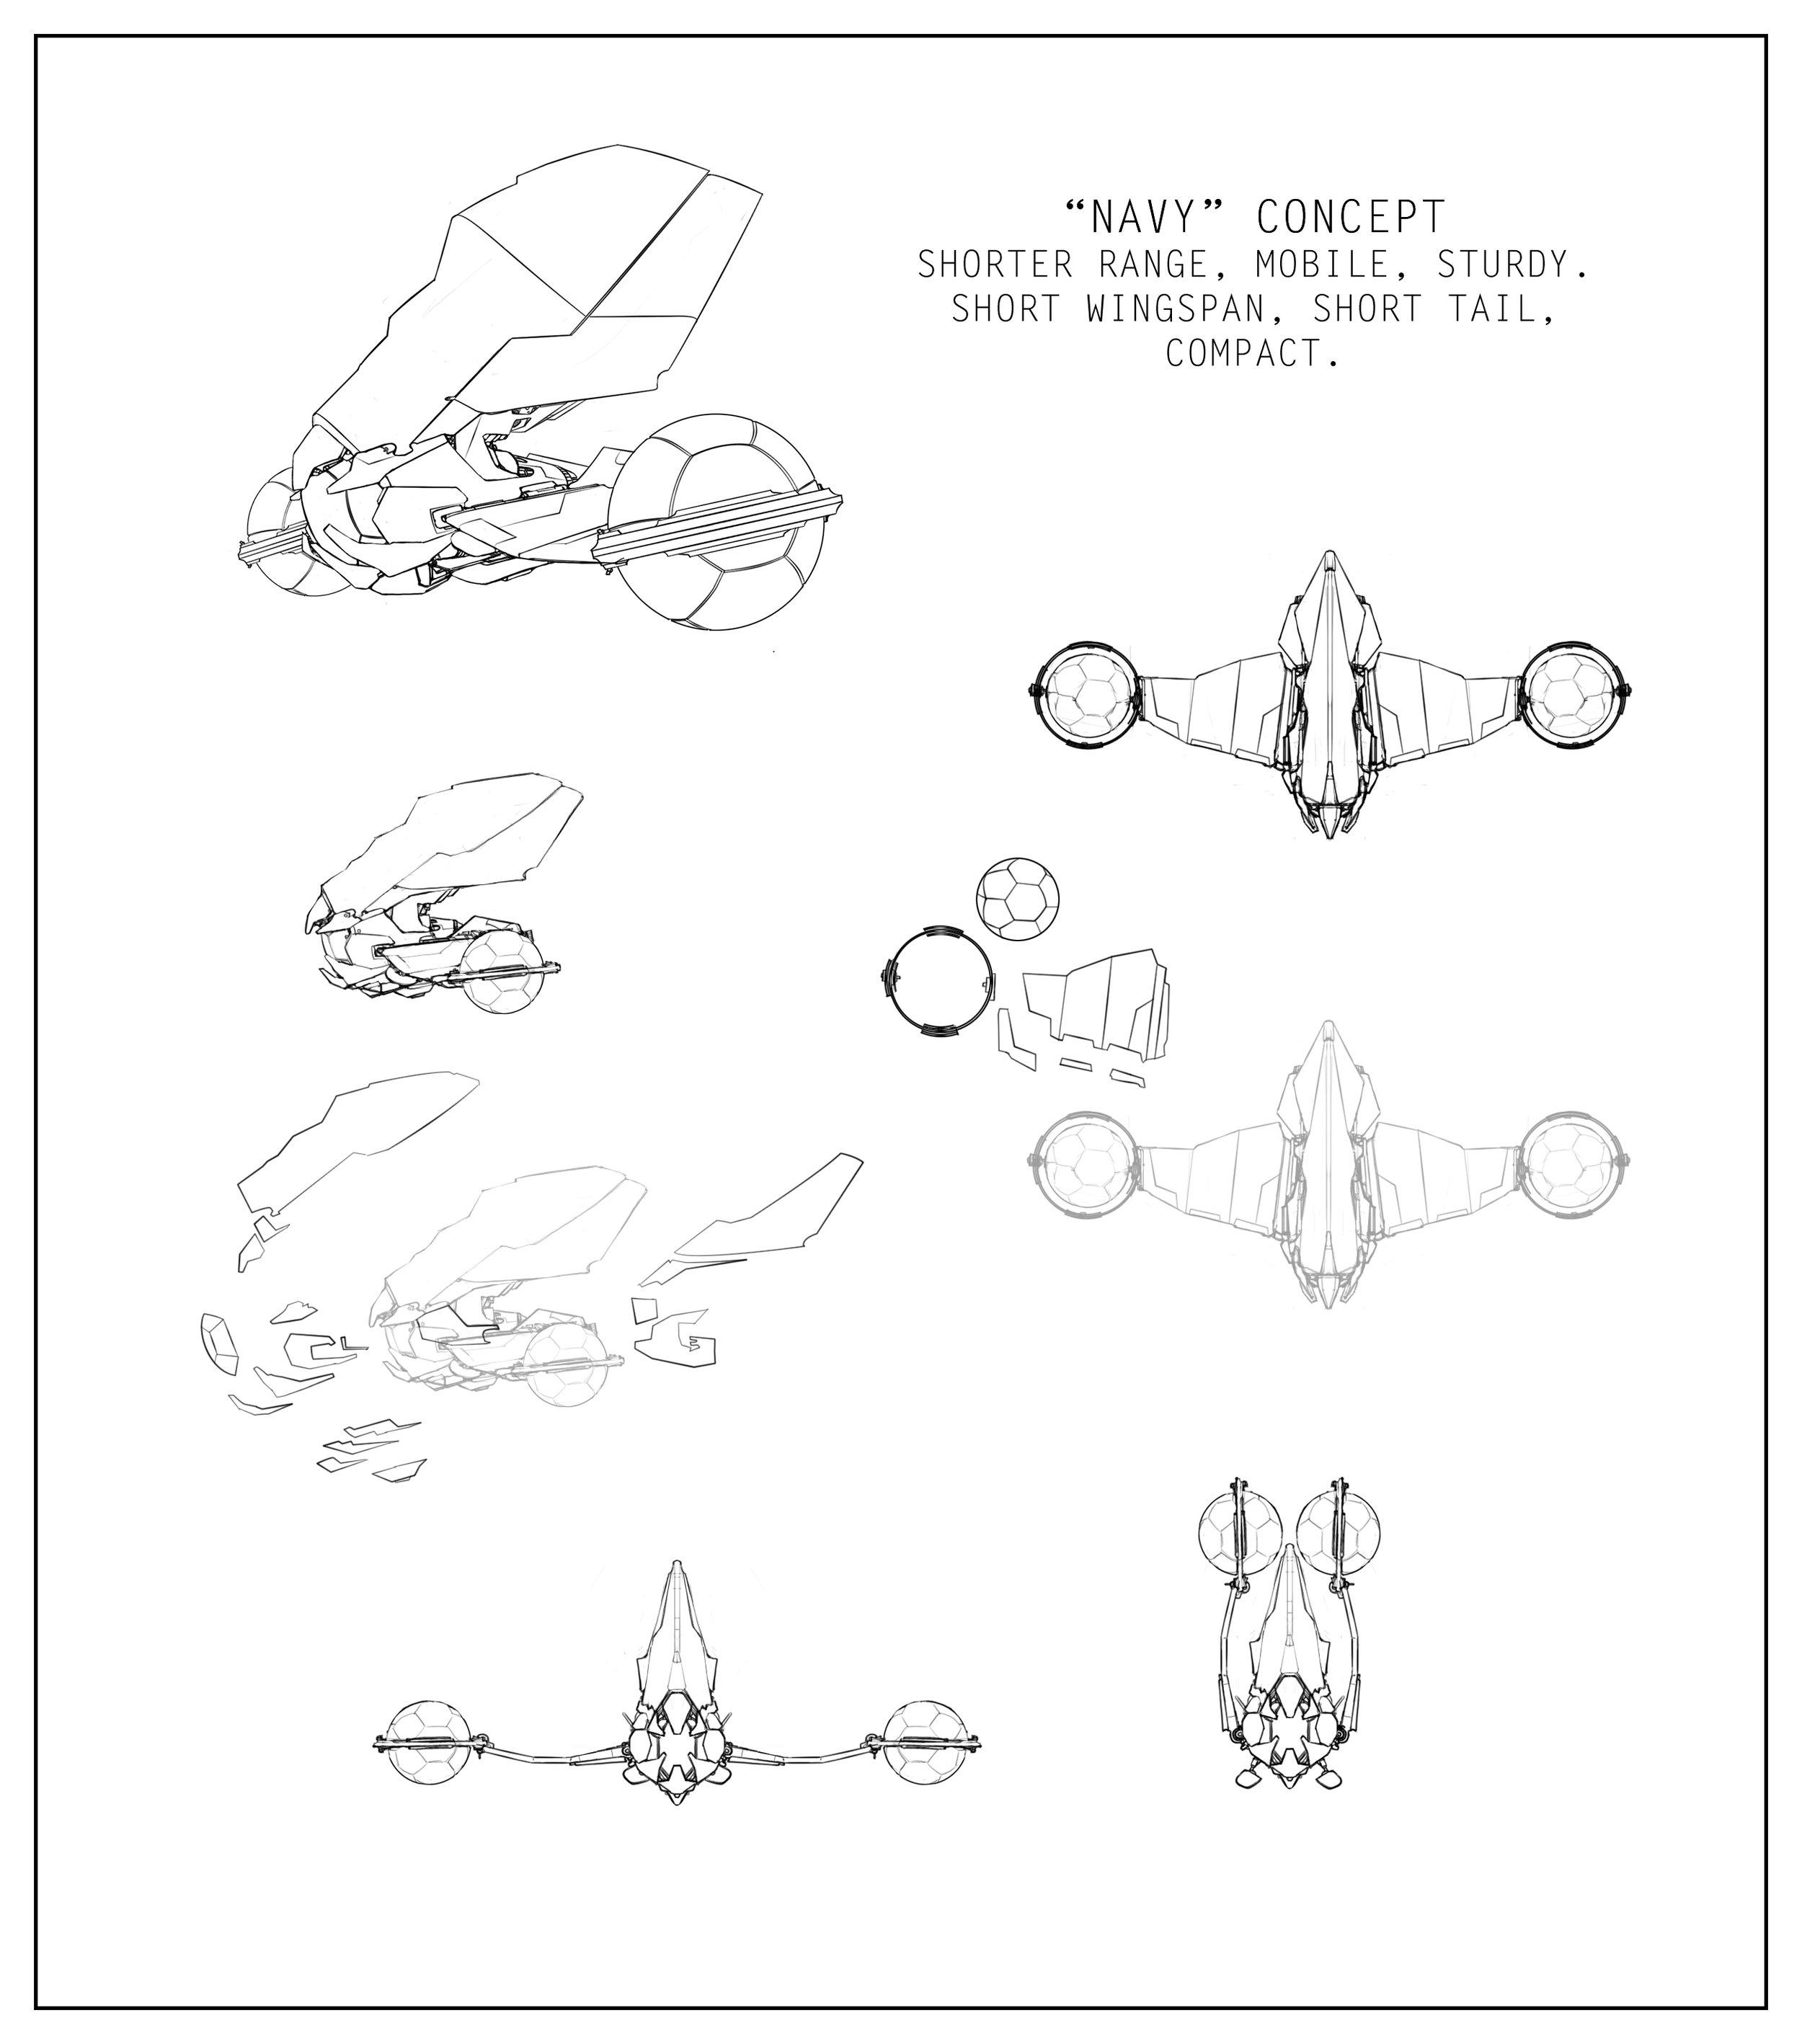 navy_concept.jpg